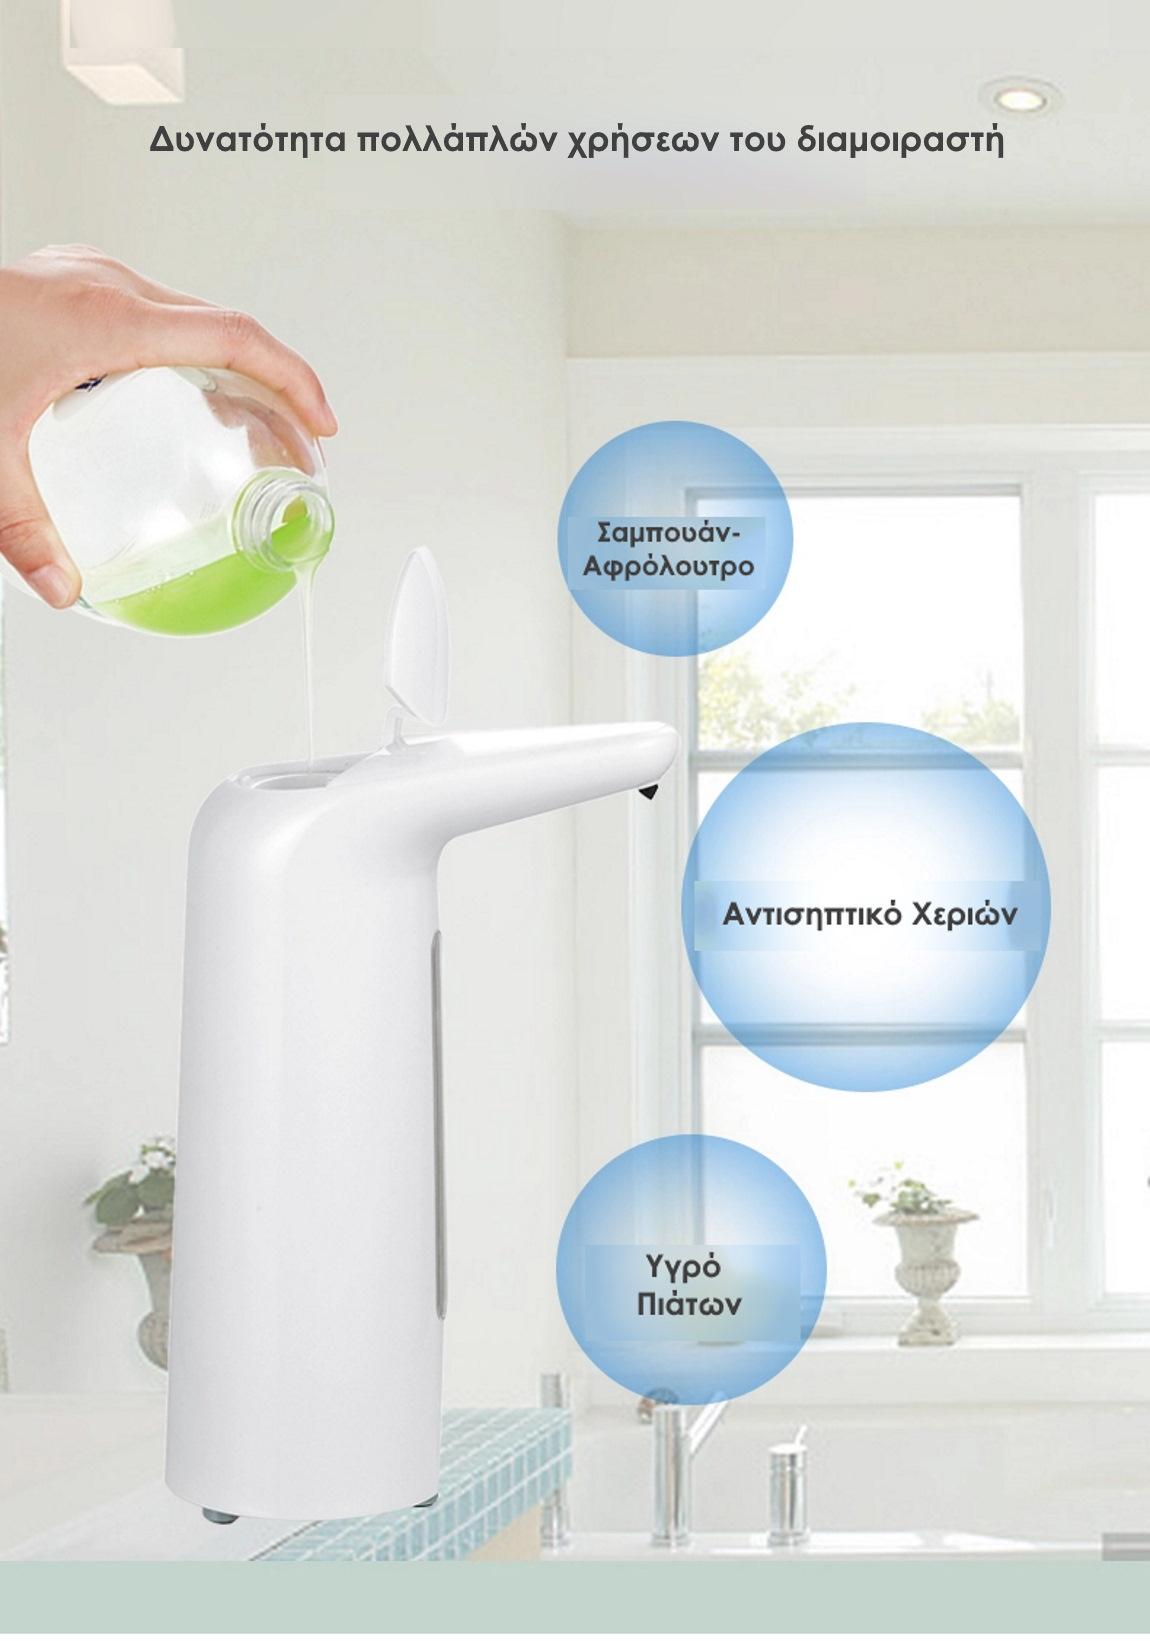 Automatic Soap Dispenser - Αυτόματος Διαμοιραστής Σαπουνιού χρήση